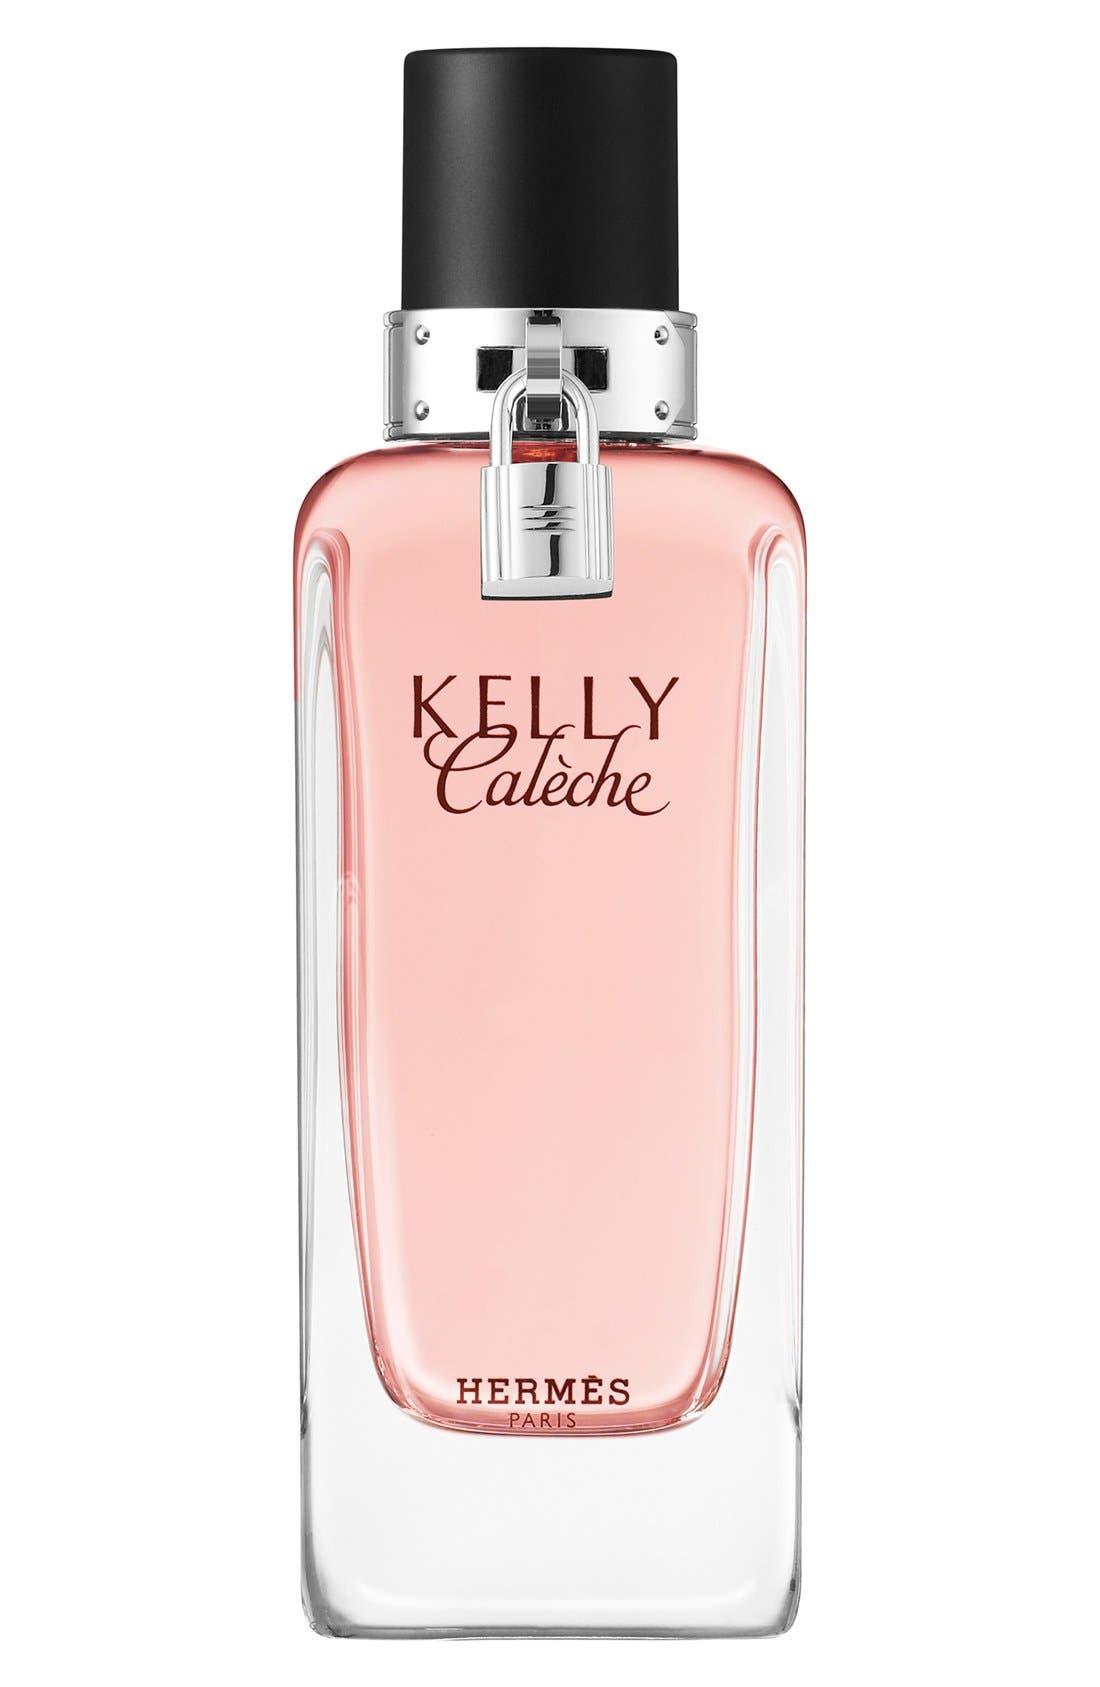 Hermes Kelly Caleche